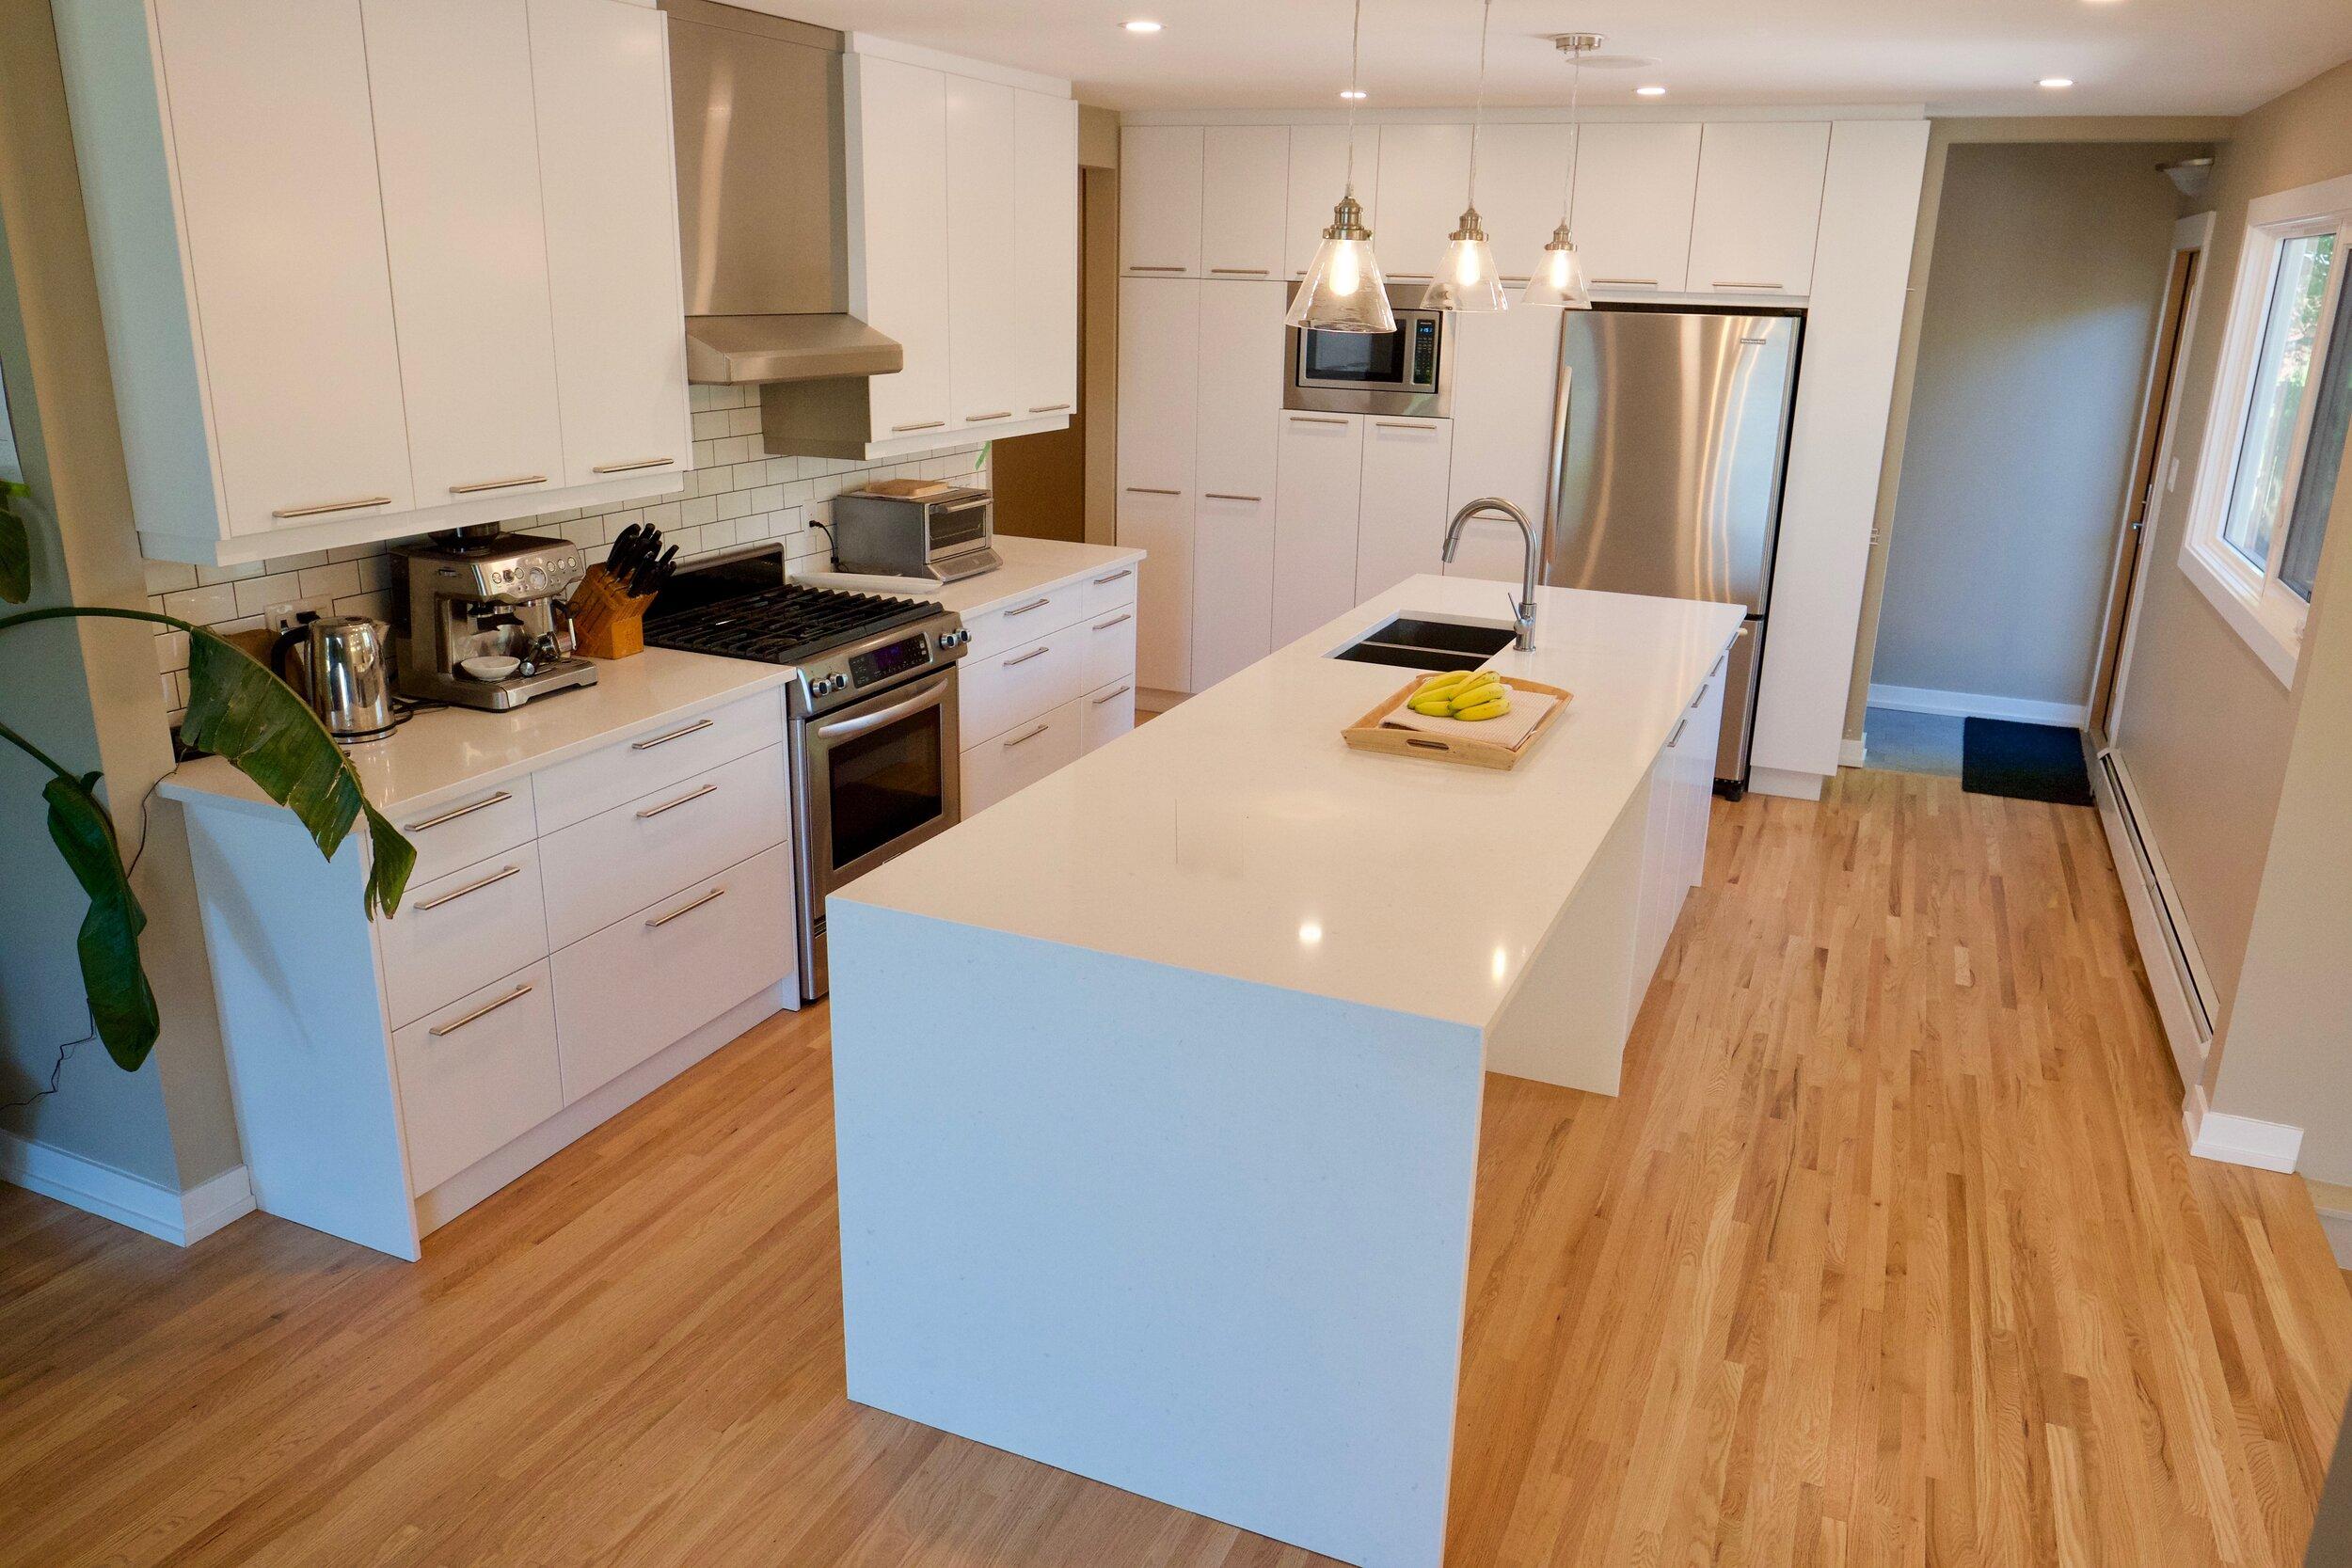 modern kitchnen, house addition Calgary.jpeg